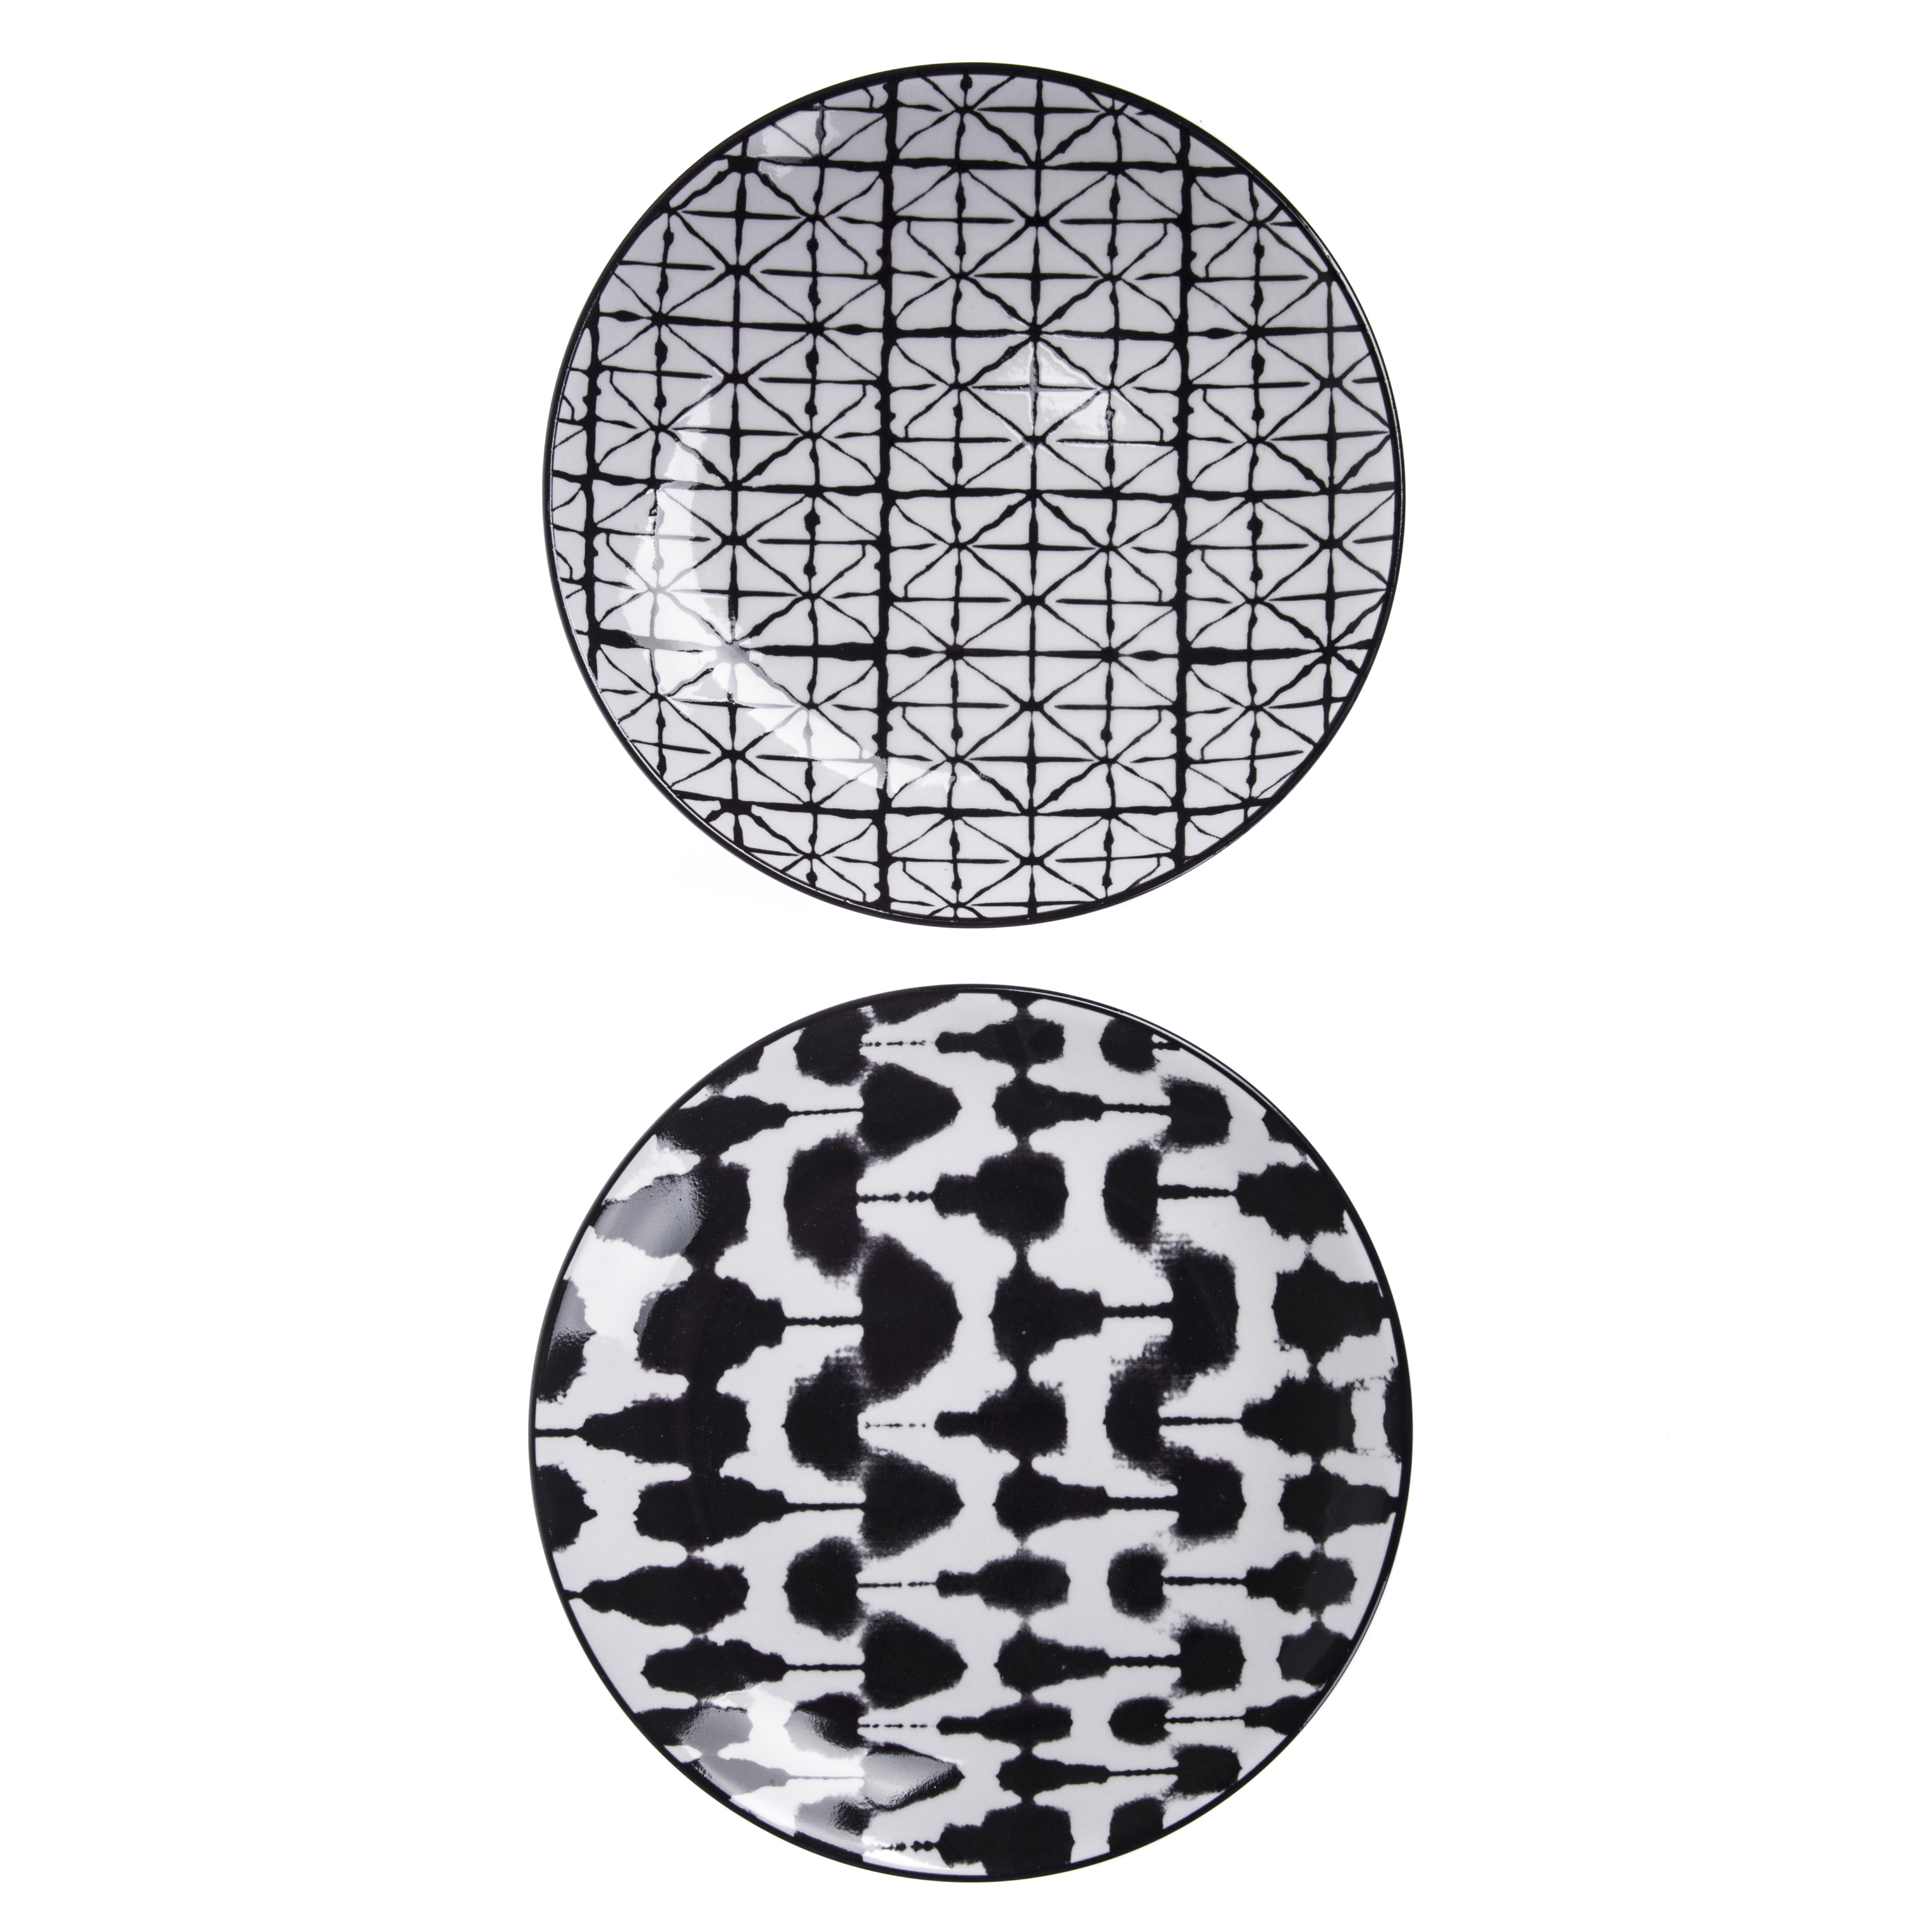 Фото - Набор тарелок Asa selection Blurred & grid 2 шт набор тарелок asa selection memphis 18 5 см 2 шт